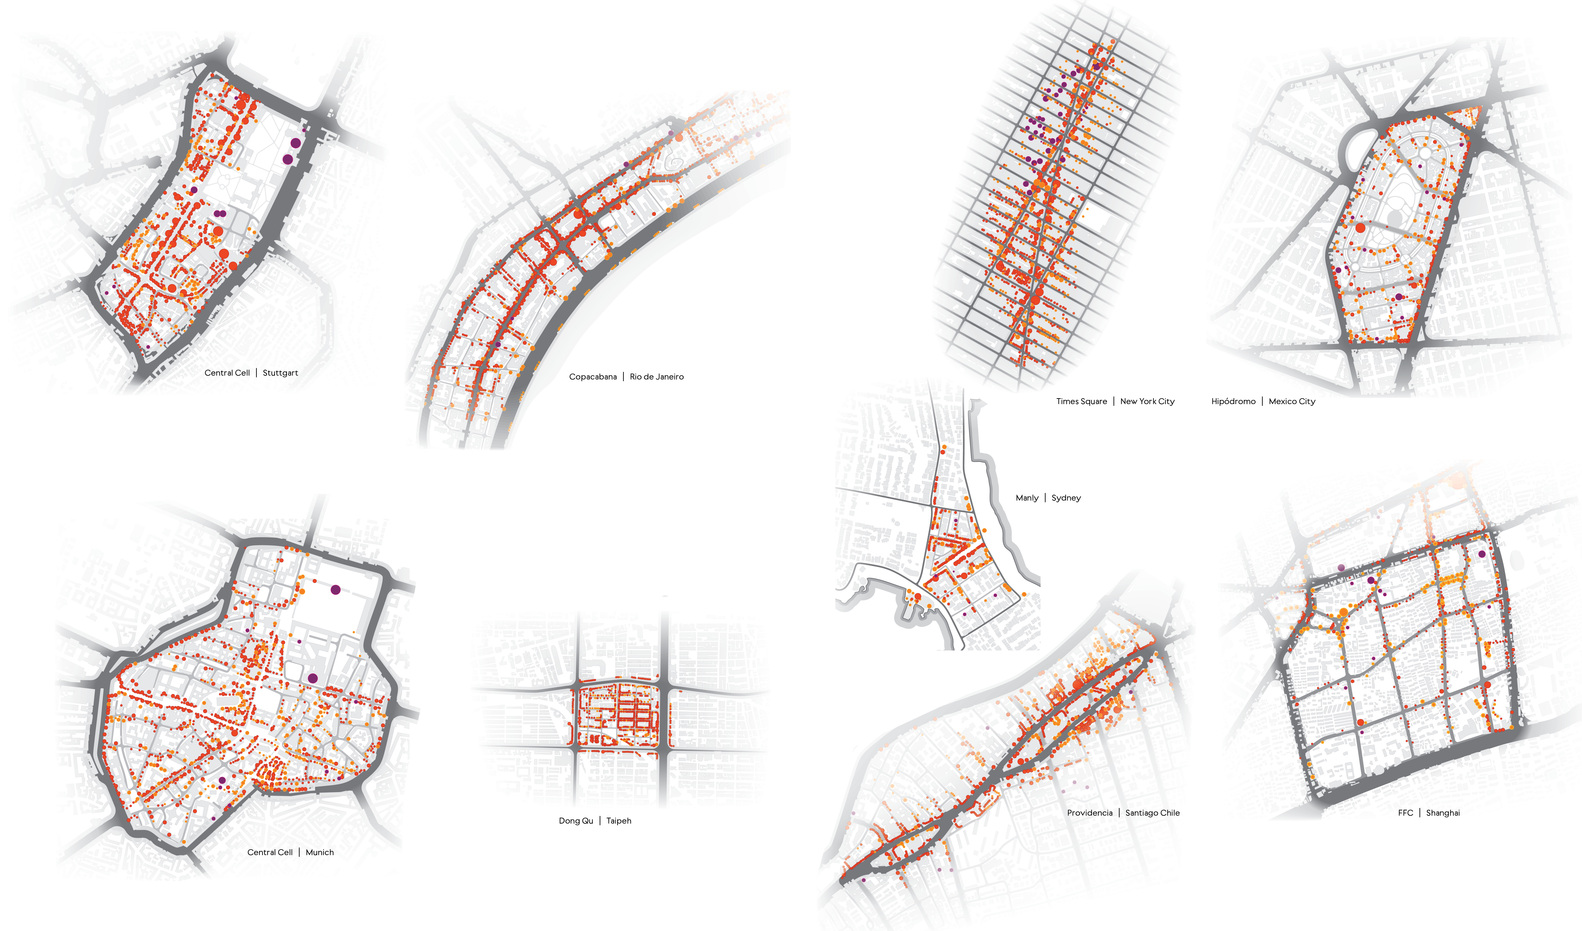 Cellular Urbanism: Analyzing the Anatomy of Functional City Block ...